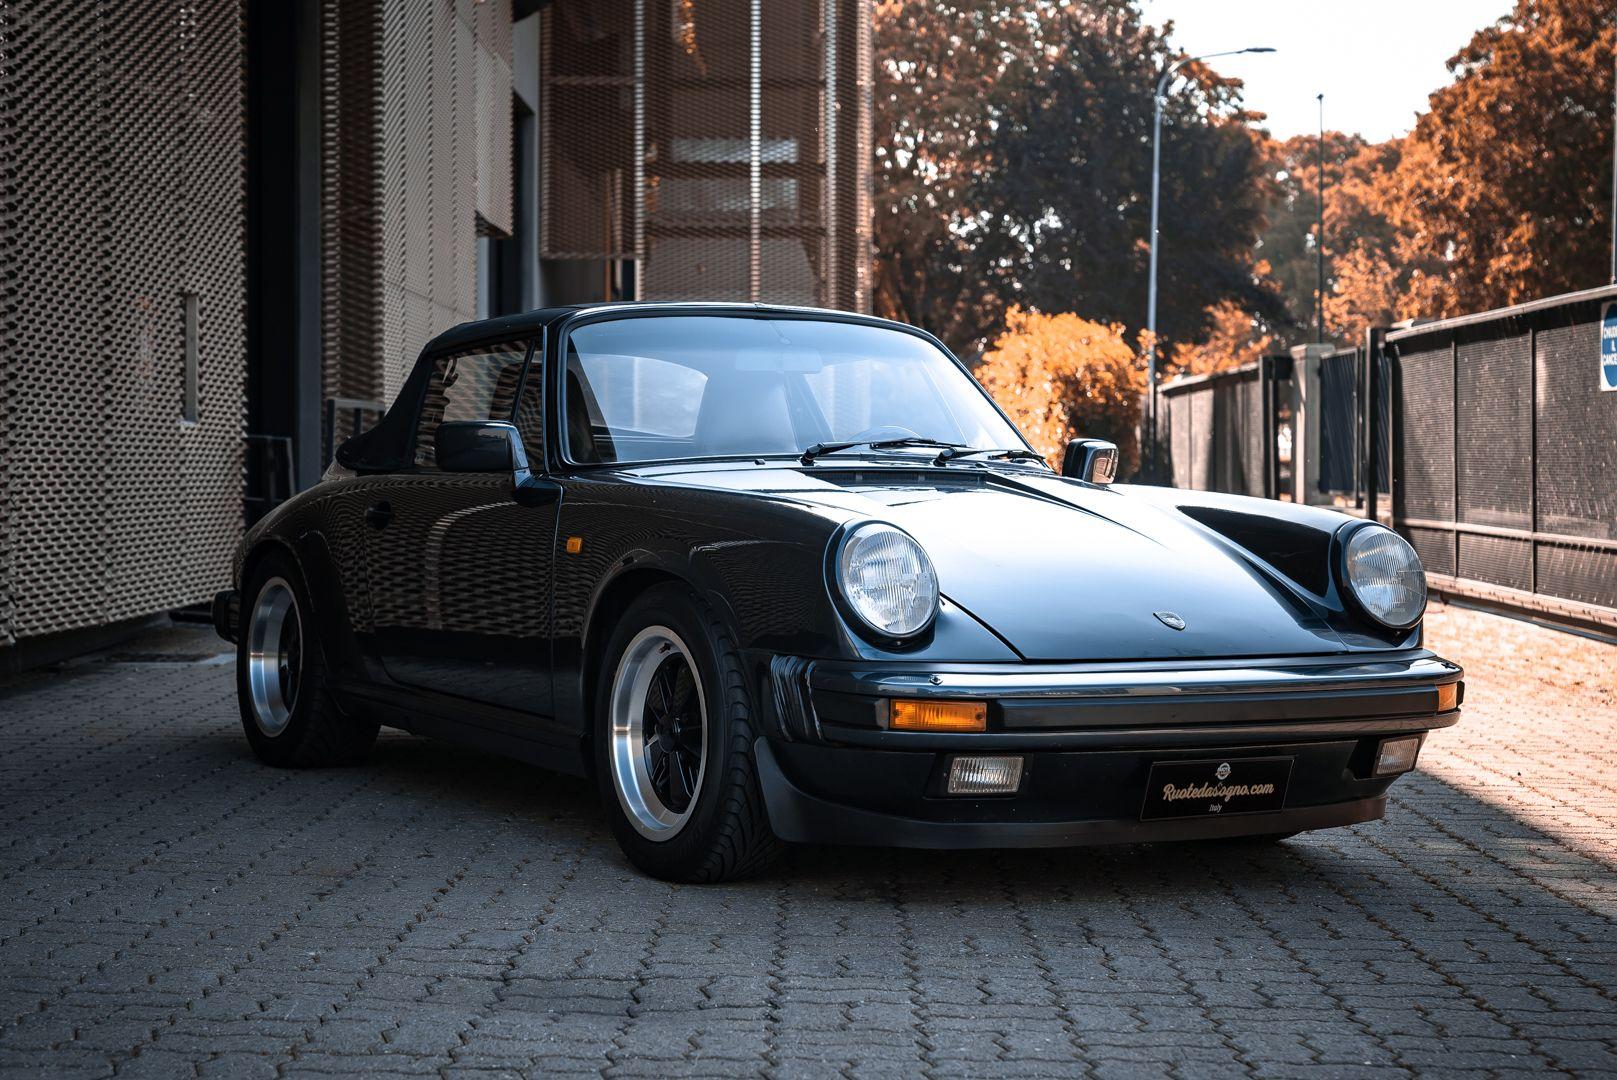 1986 Porsche 911 Carrera 3.2 Cabrio 70888